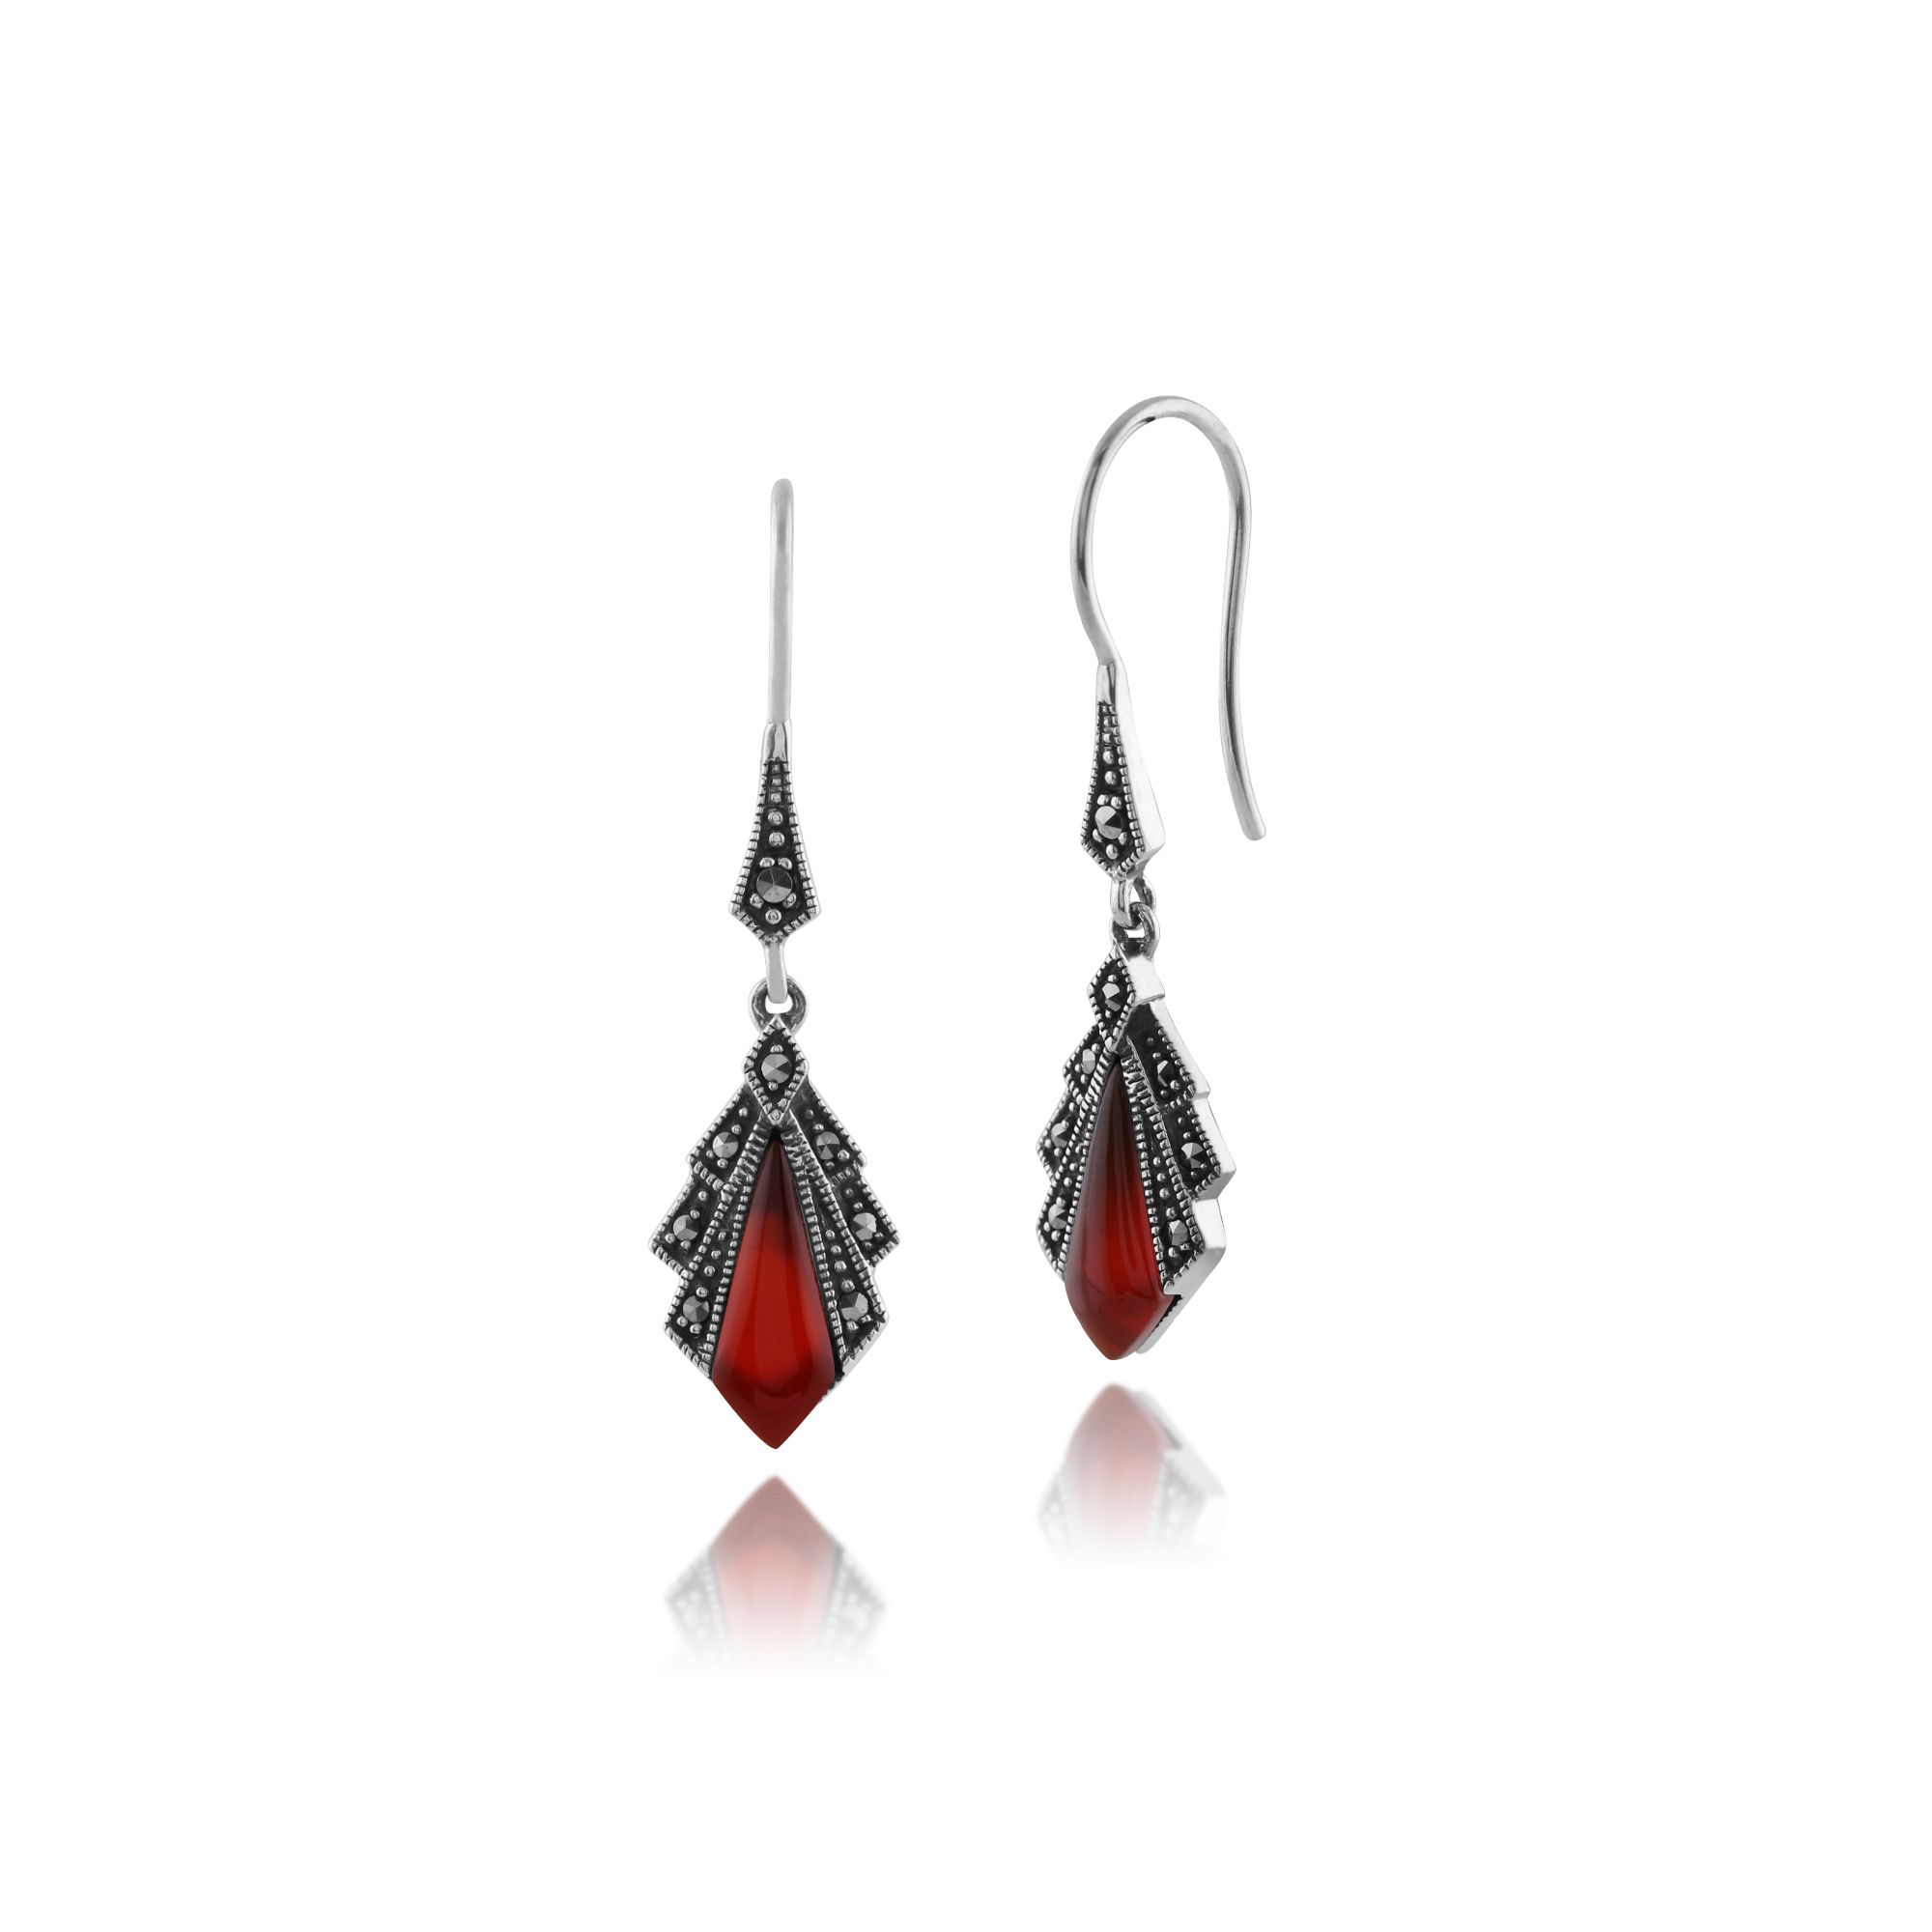 gemondo 925 sterling silver 1ct carnelian marcasite art deco drop earrings ebay. Black Bedroom Furniture Sets. Home Design Ideas